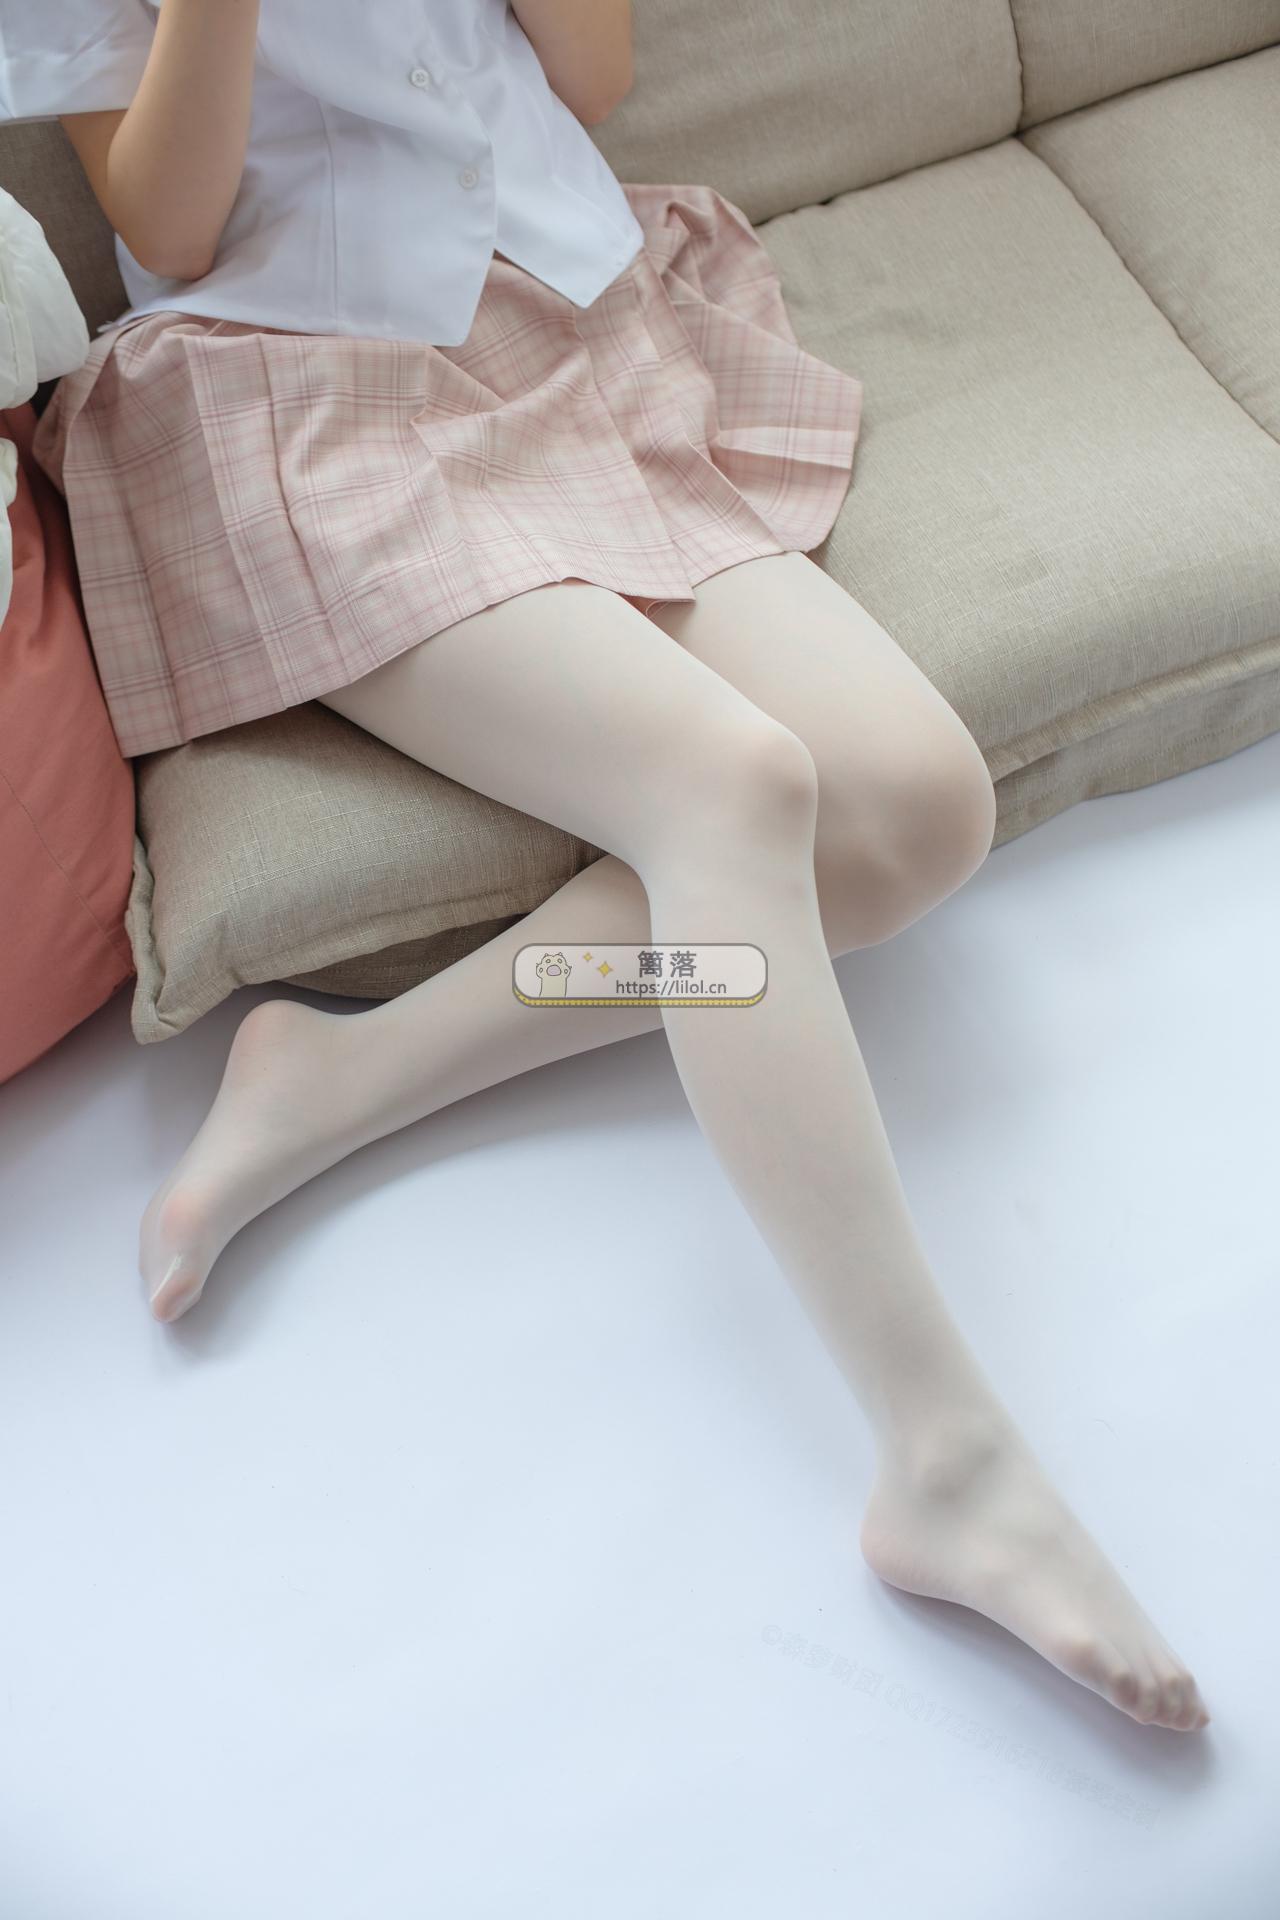 【SSR系列】森萝财团写真 SSR-012 粉色头发少女JK制服+白丝的小情调 [91图-0视频-1GB] SSR系列 第2张